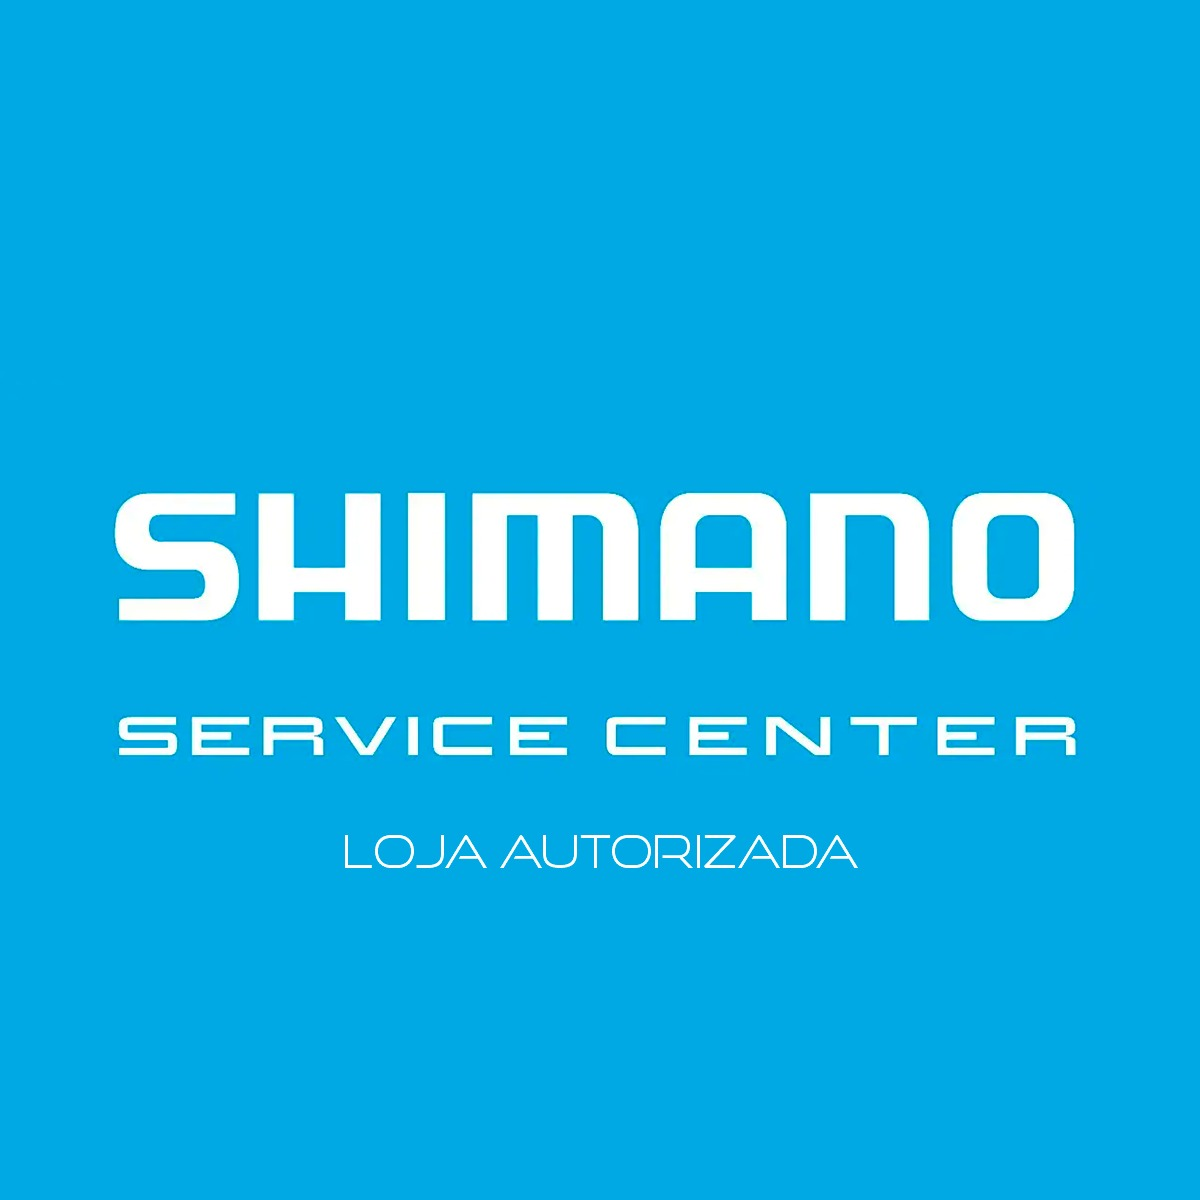 Disco Rotor Shimano Sm-RT54 160mm Center Look